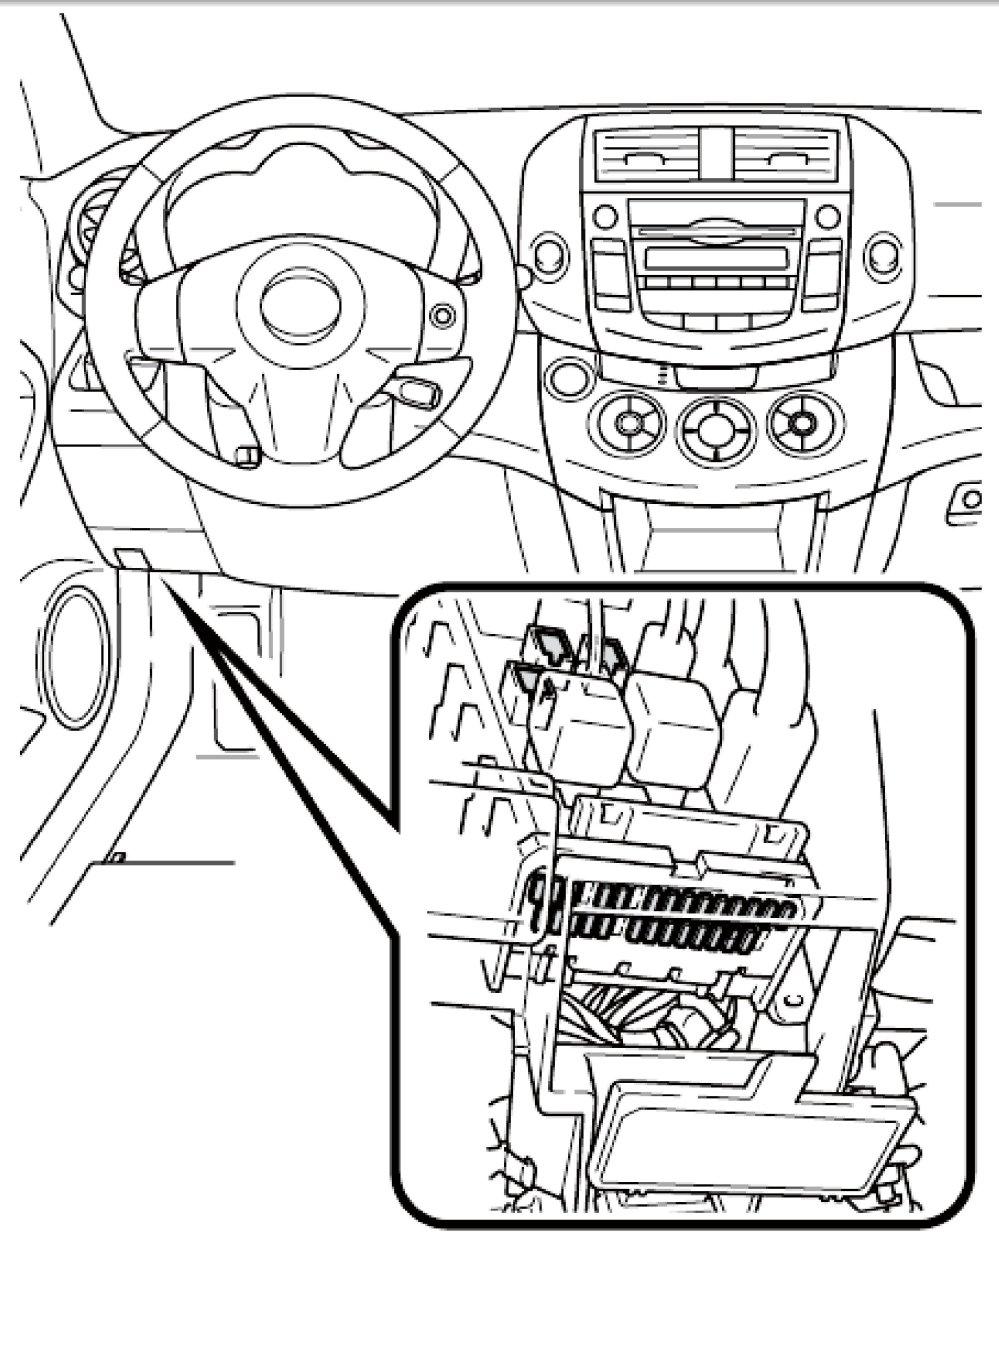 medium resolution of 1993 chevy lumina fuse box diagram